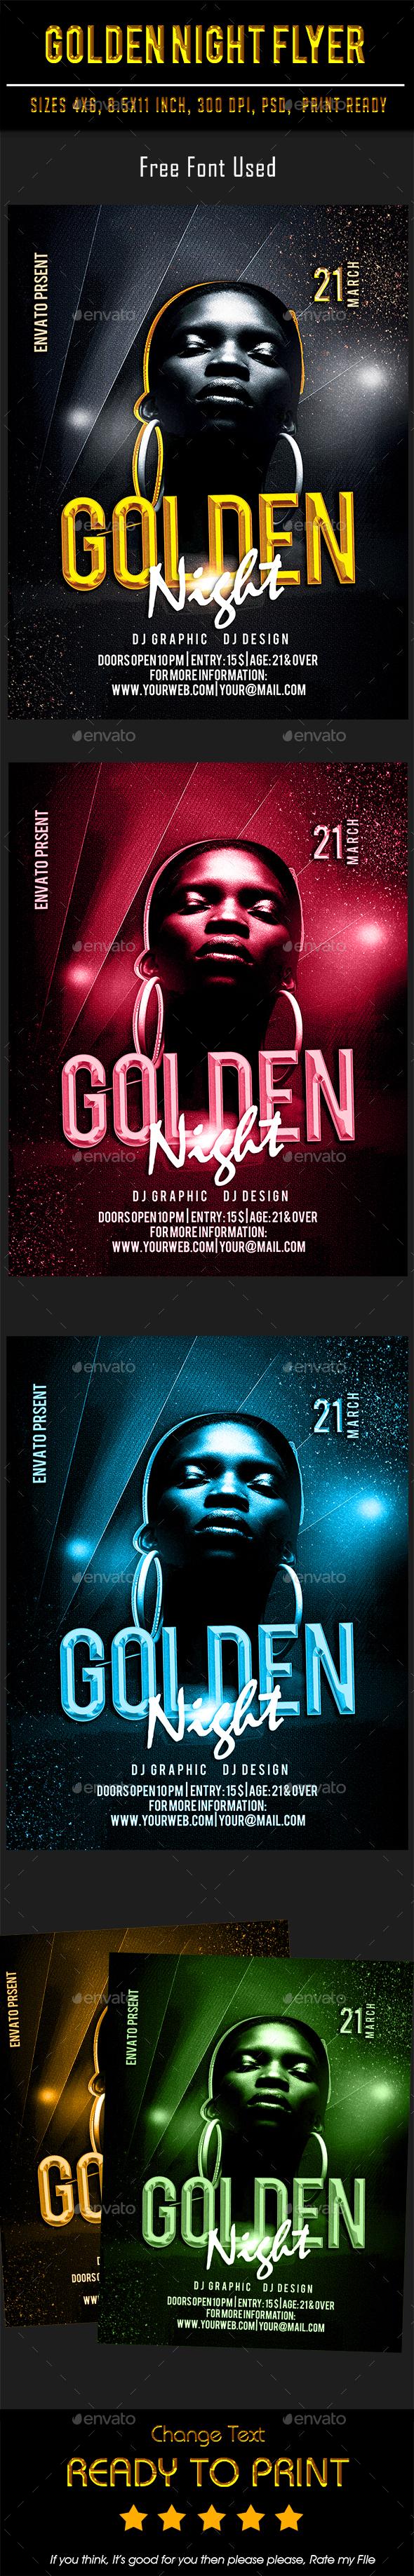 Golden Night Flyer - Flyers Print Templates